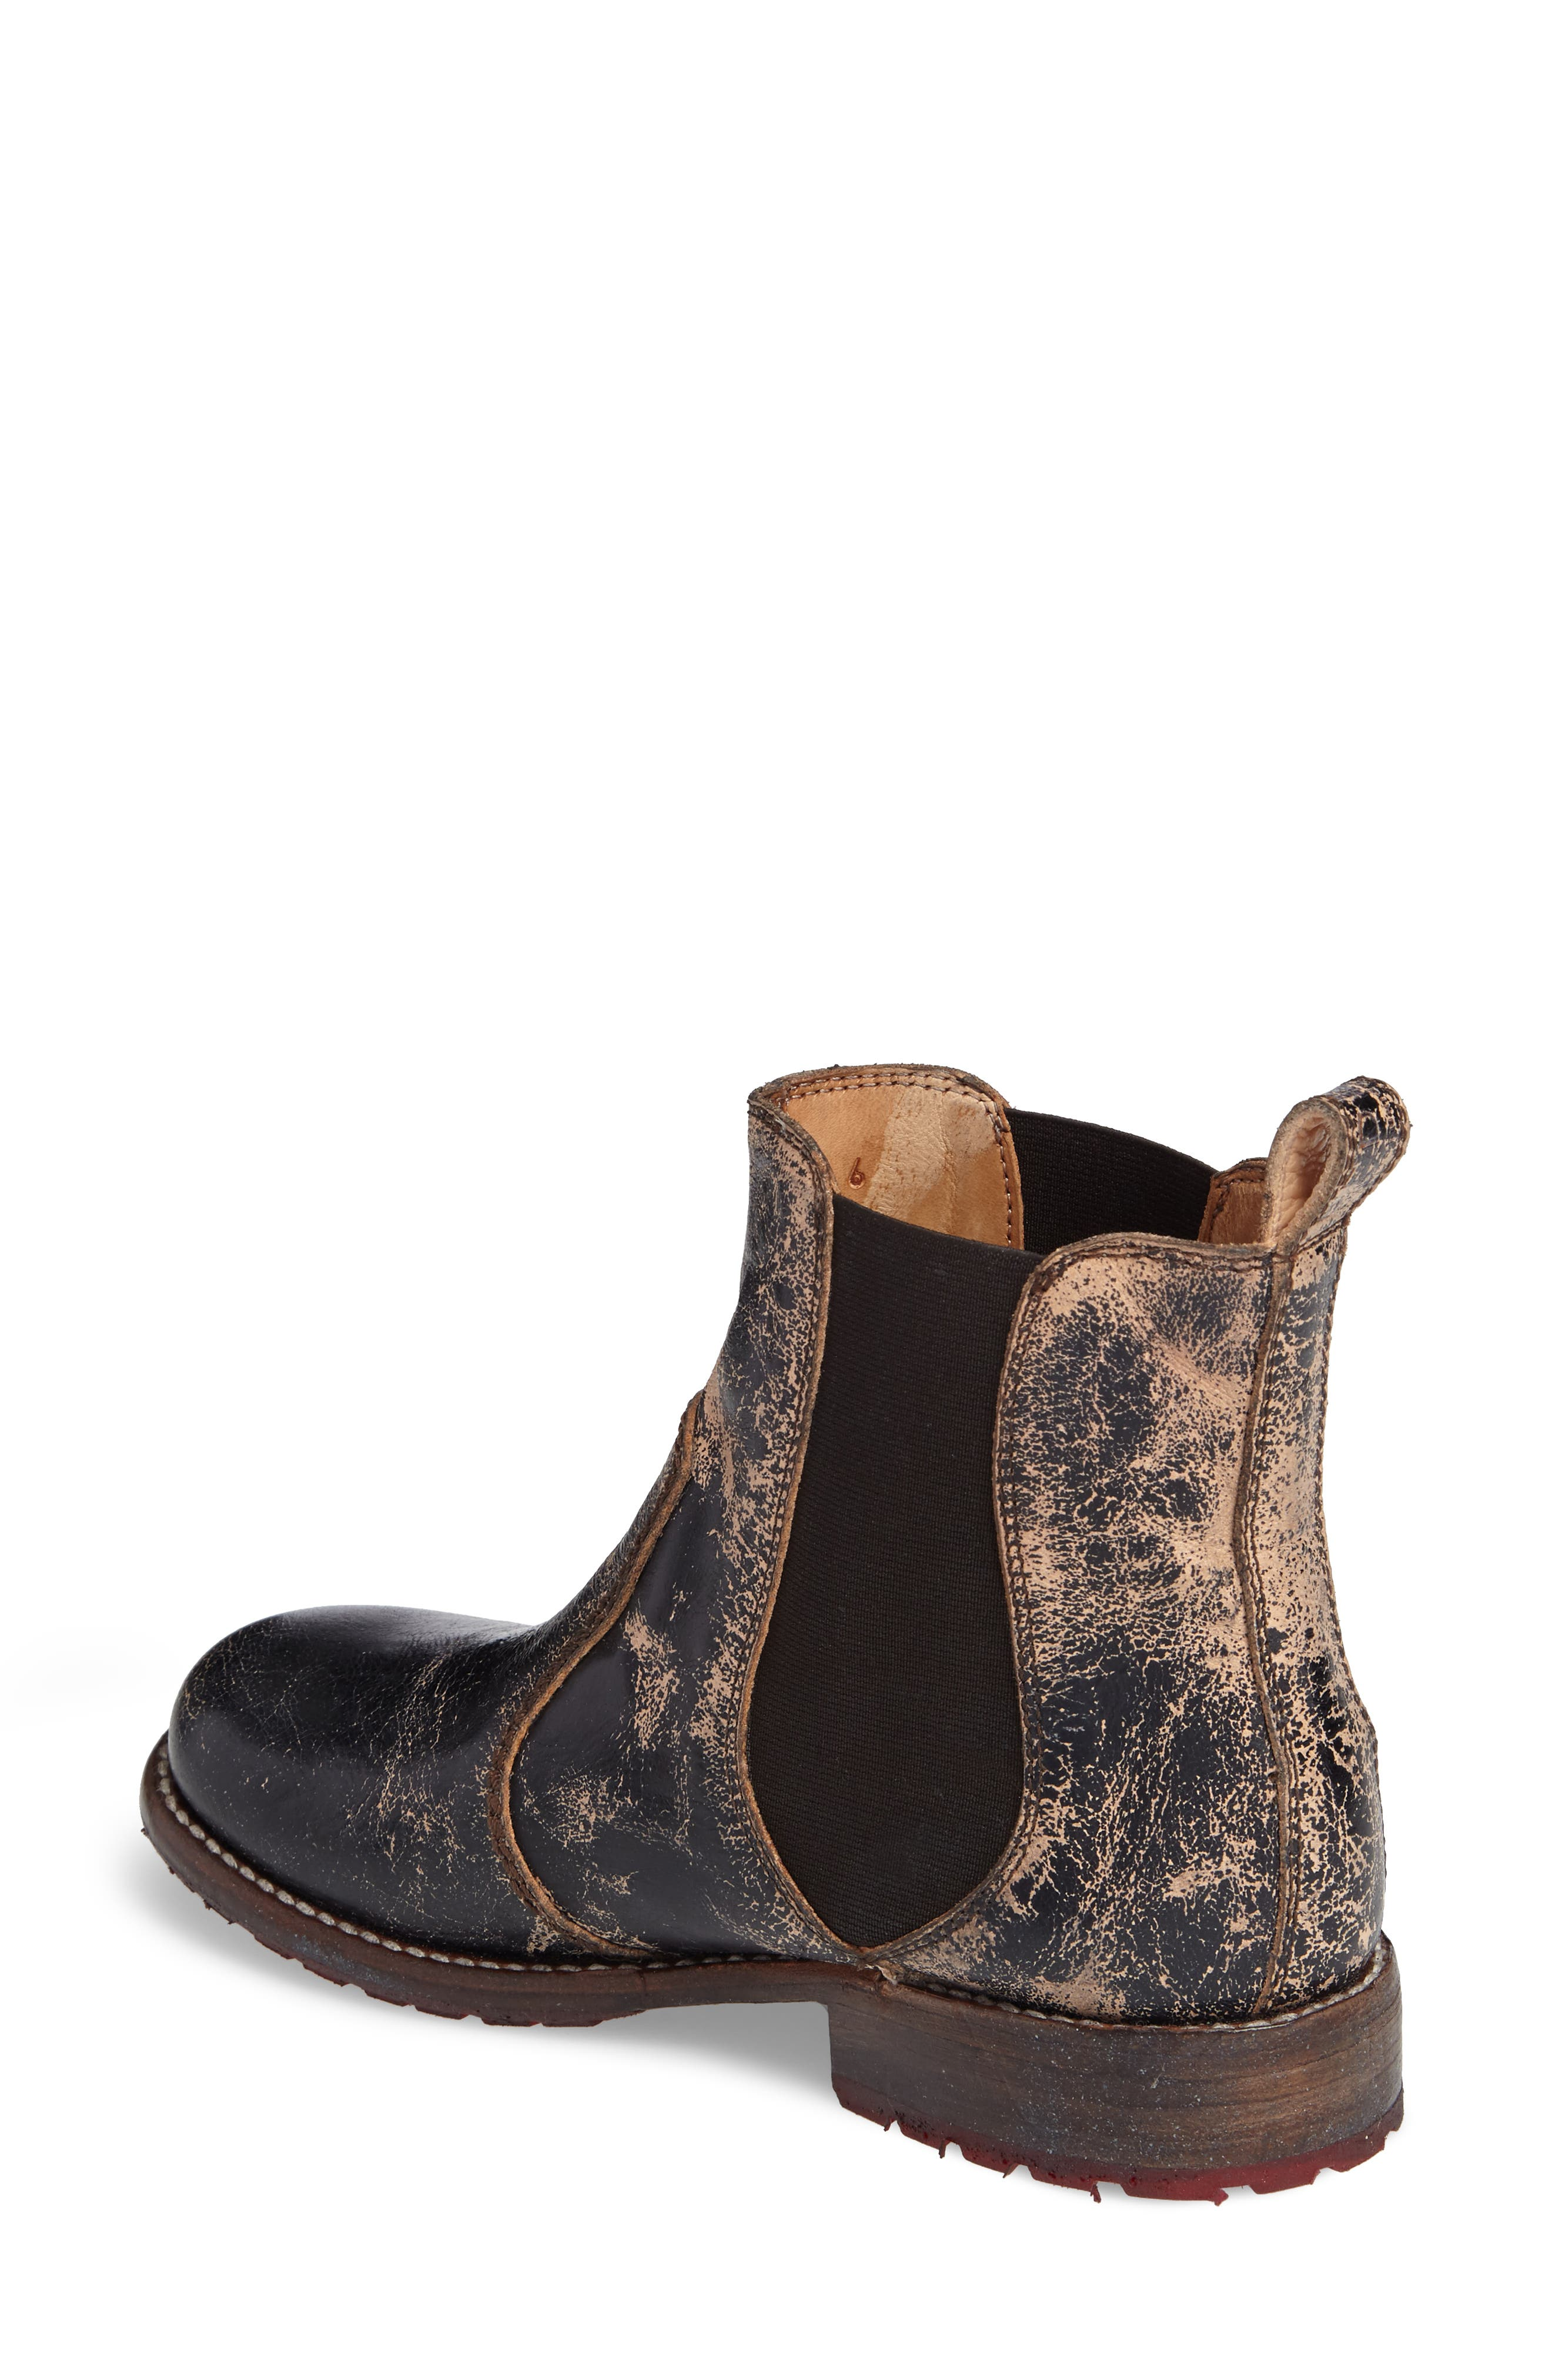 Alternate Image 2  - Bed Stu Nandi Chelsea Boot (Women)